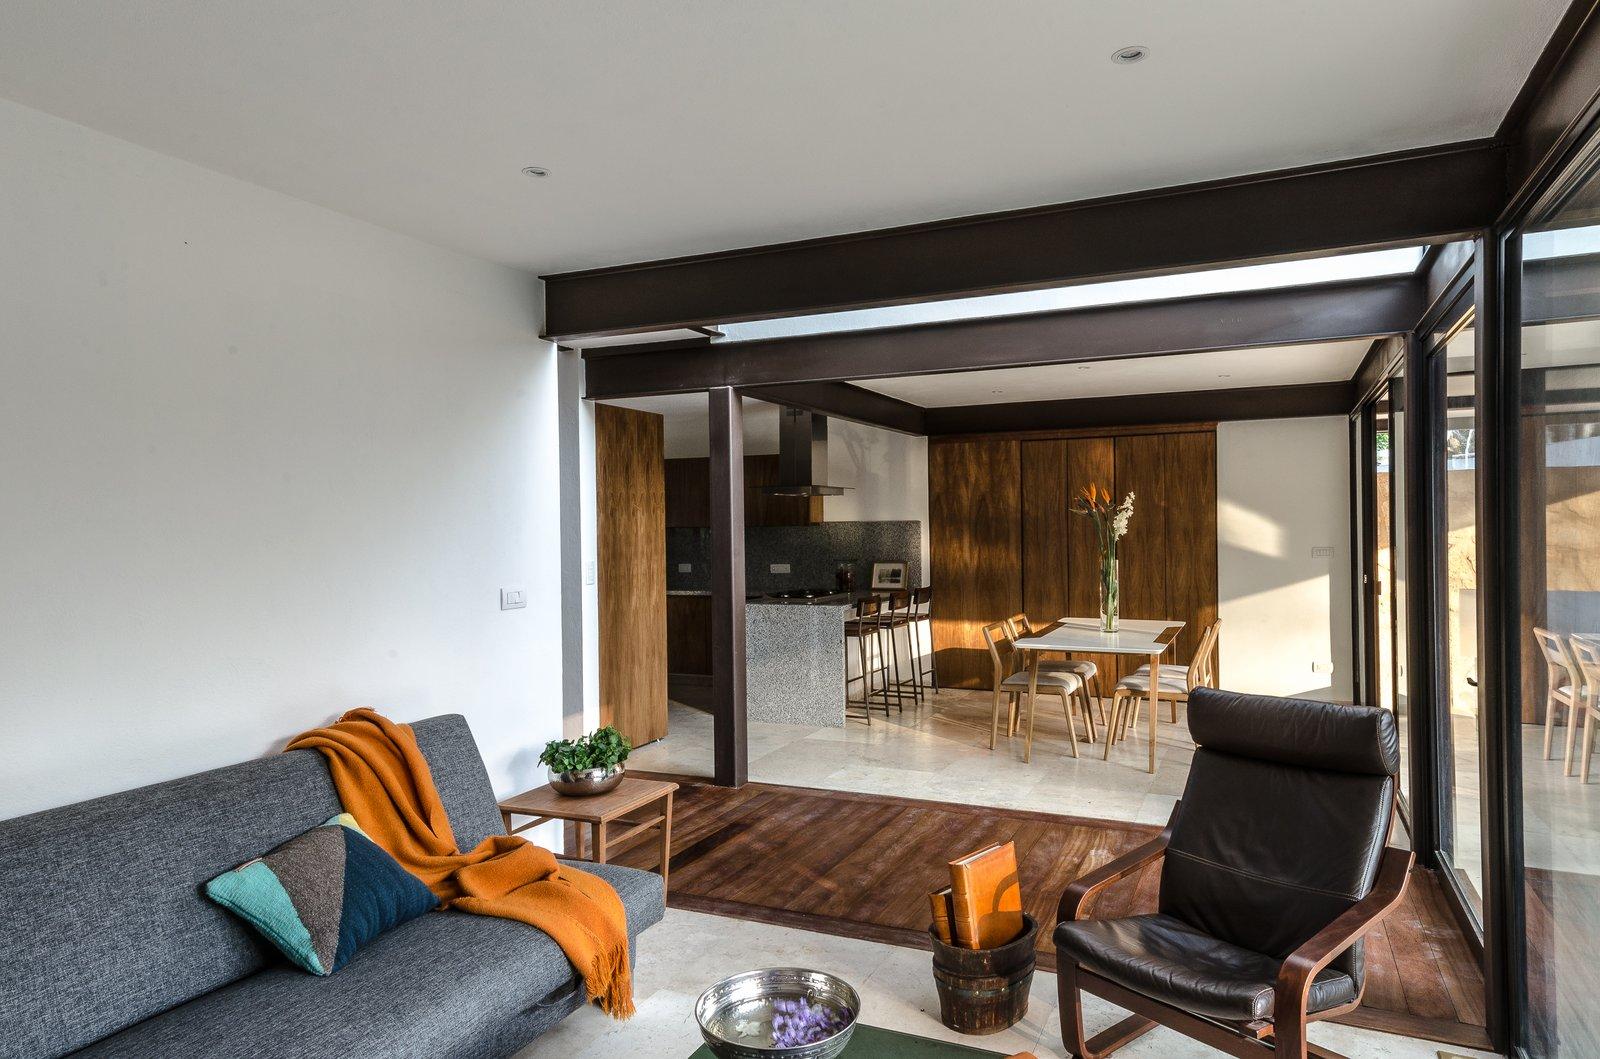 Living room Tagged: Living Room, Travertine Floor, Sofa, Dark Hardwood Floor, Ceiling Lighting, and Recliner.  CQ12 by tescala